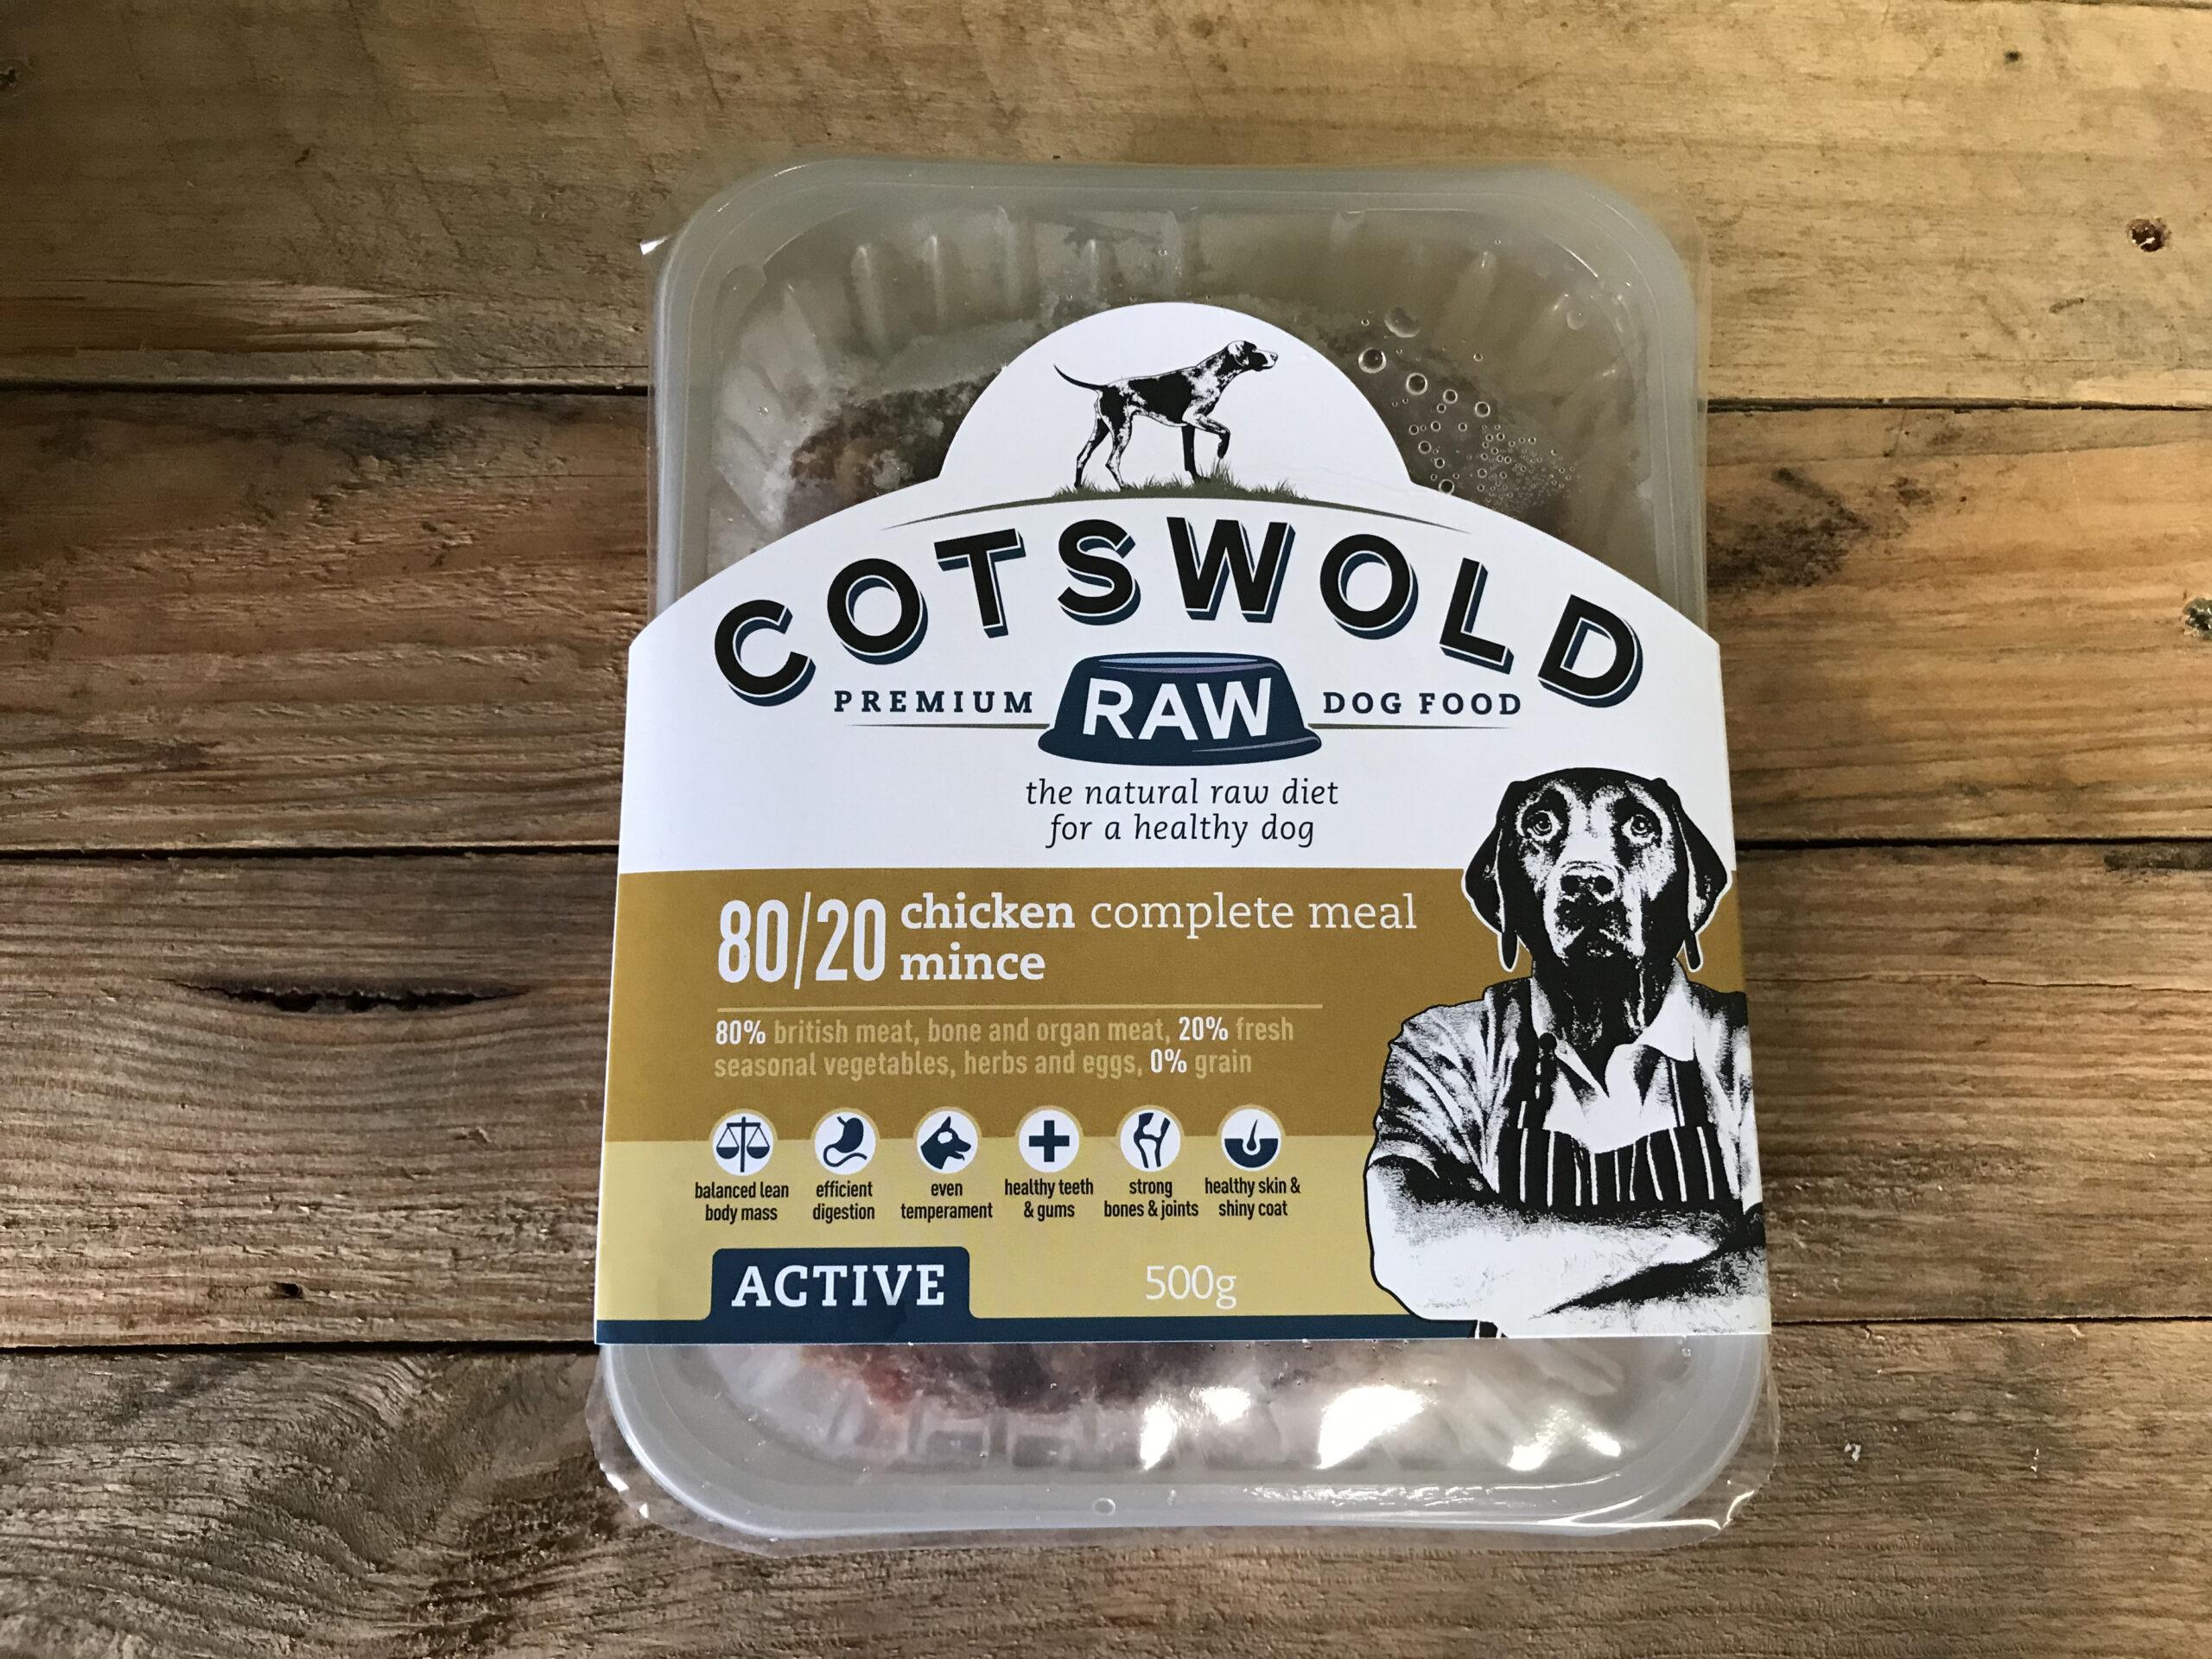 Cotswold Chicken 80/20 – 500g